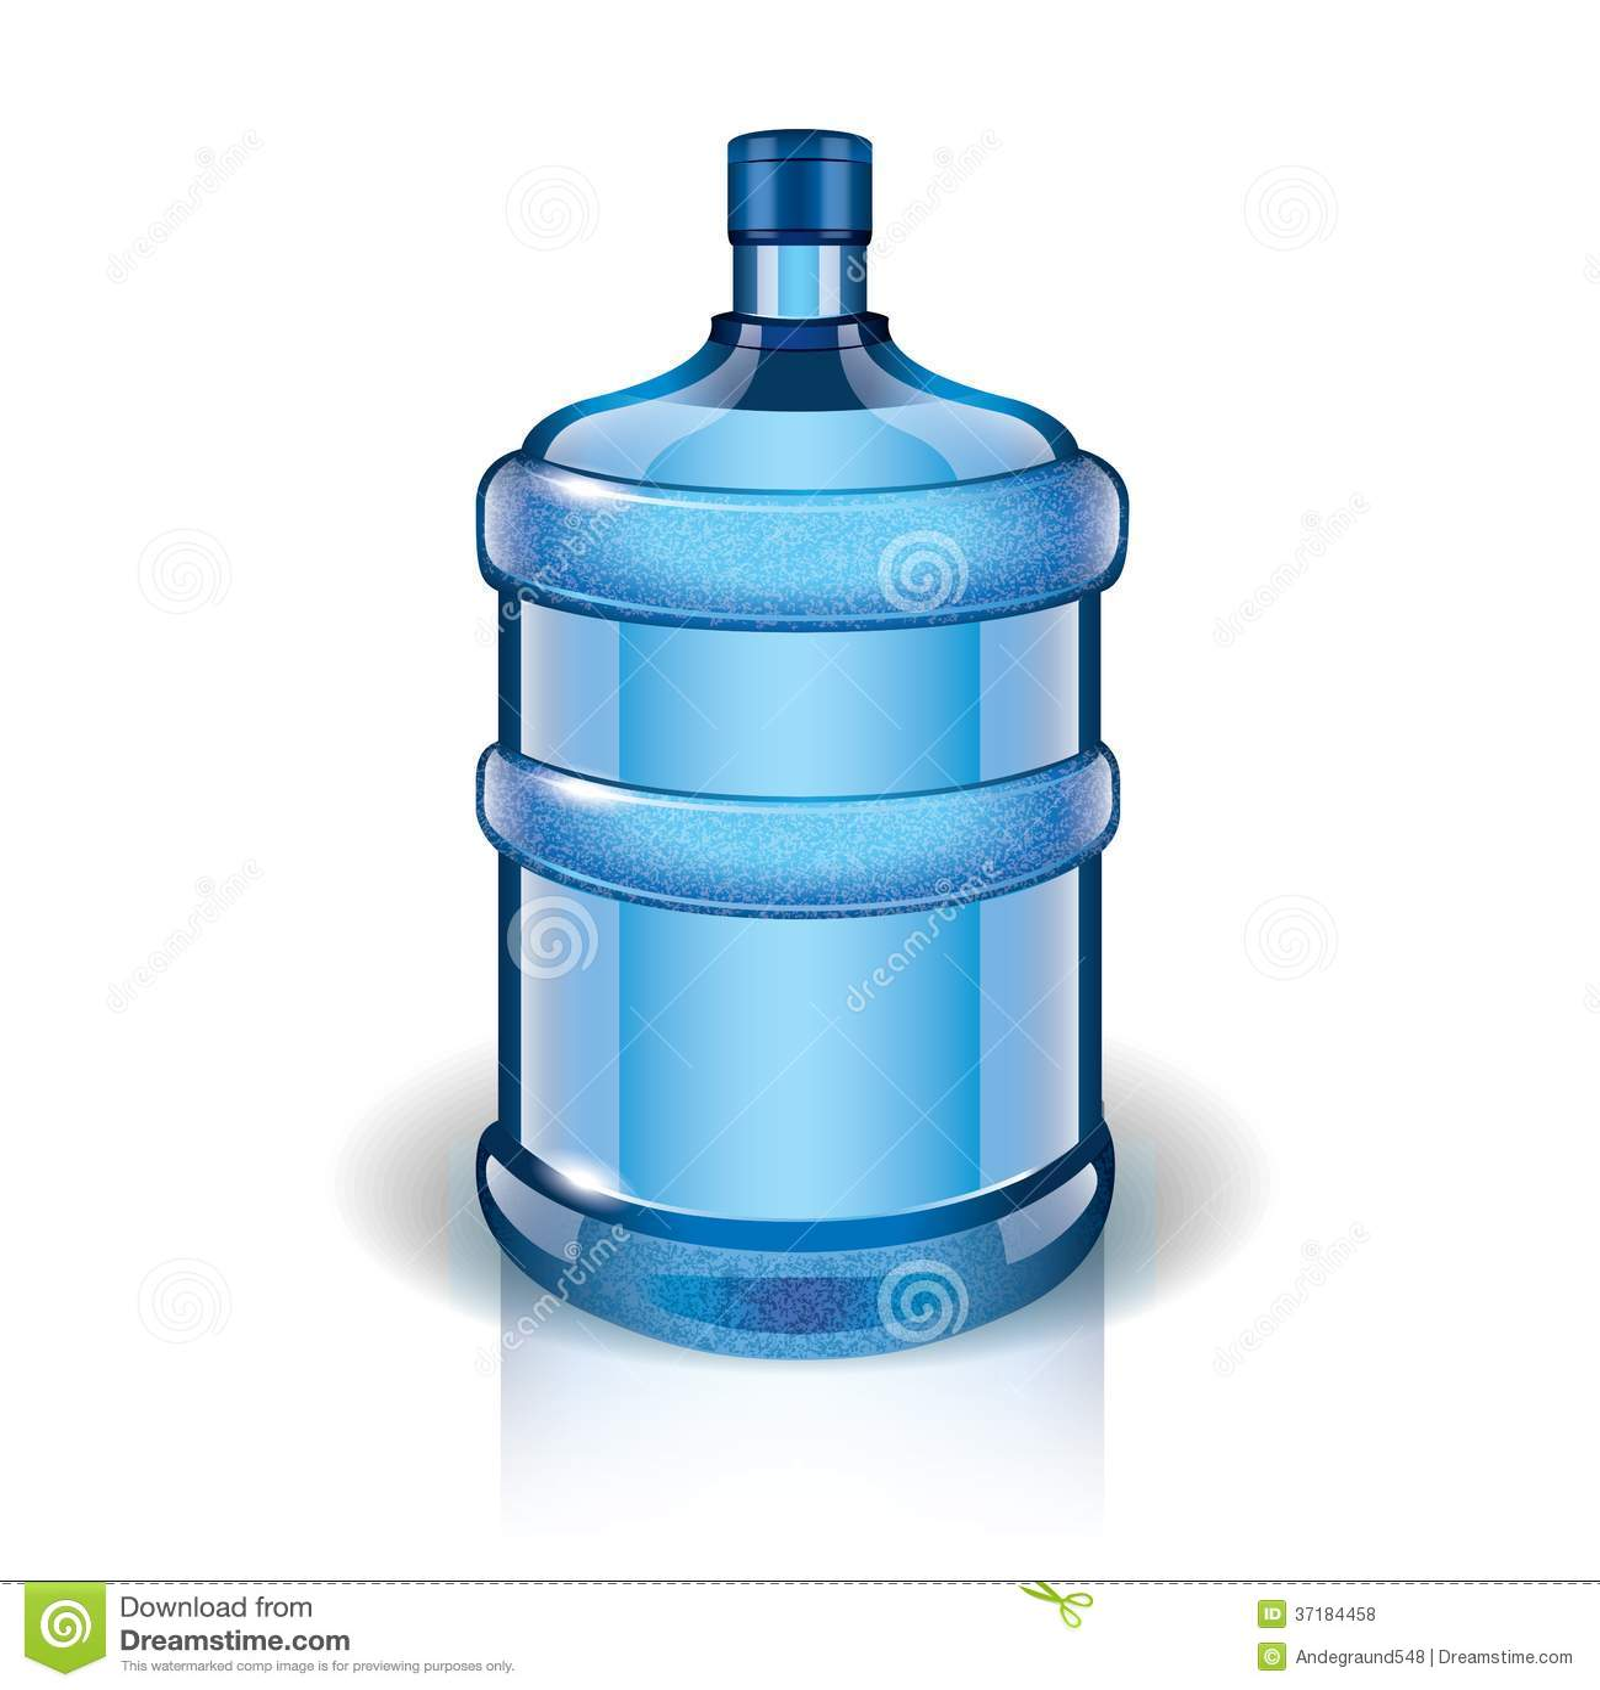 Water Bottle Vector: Water Bottle Vector Illustration Stock Vector